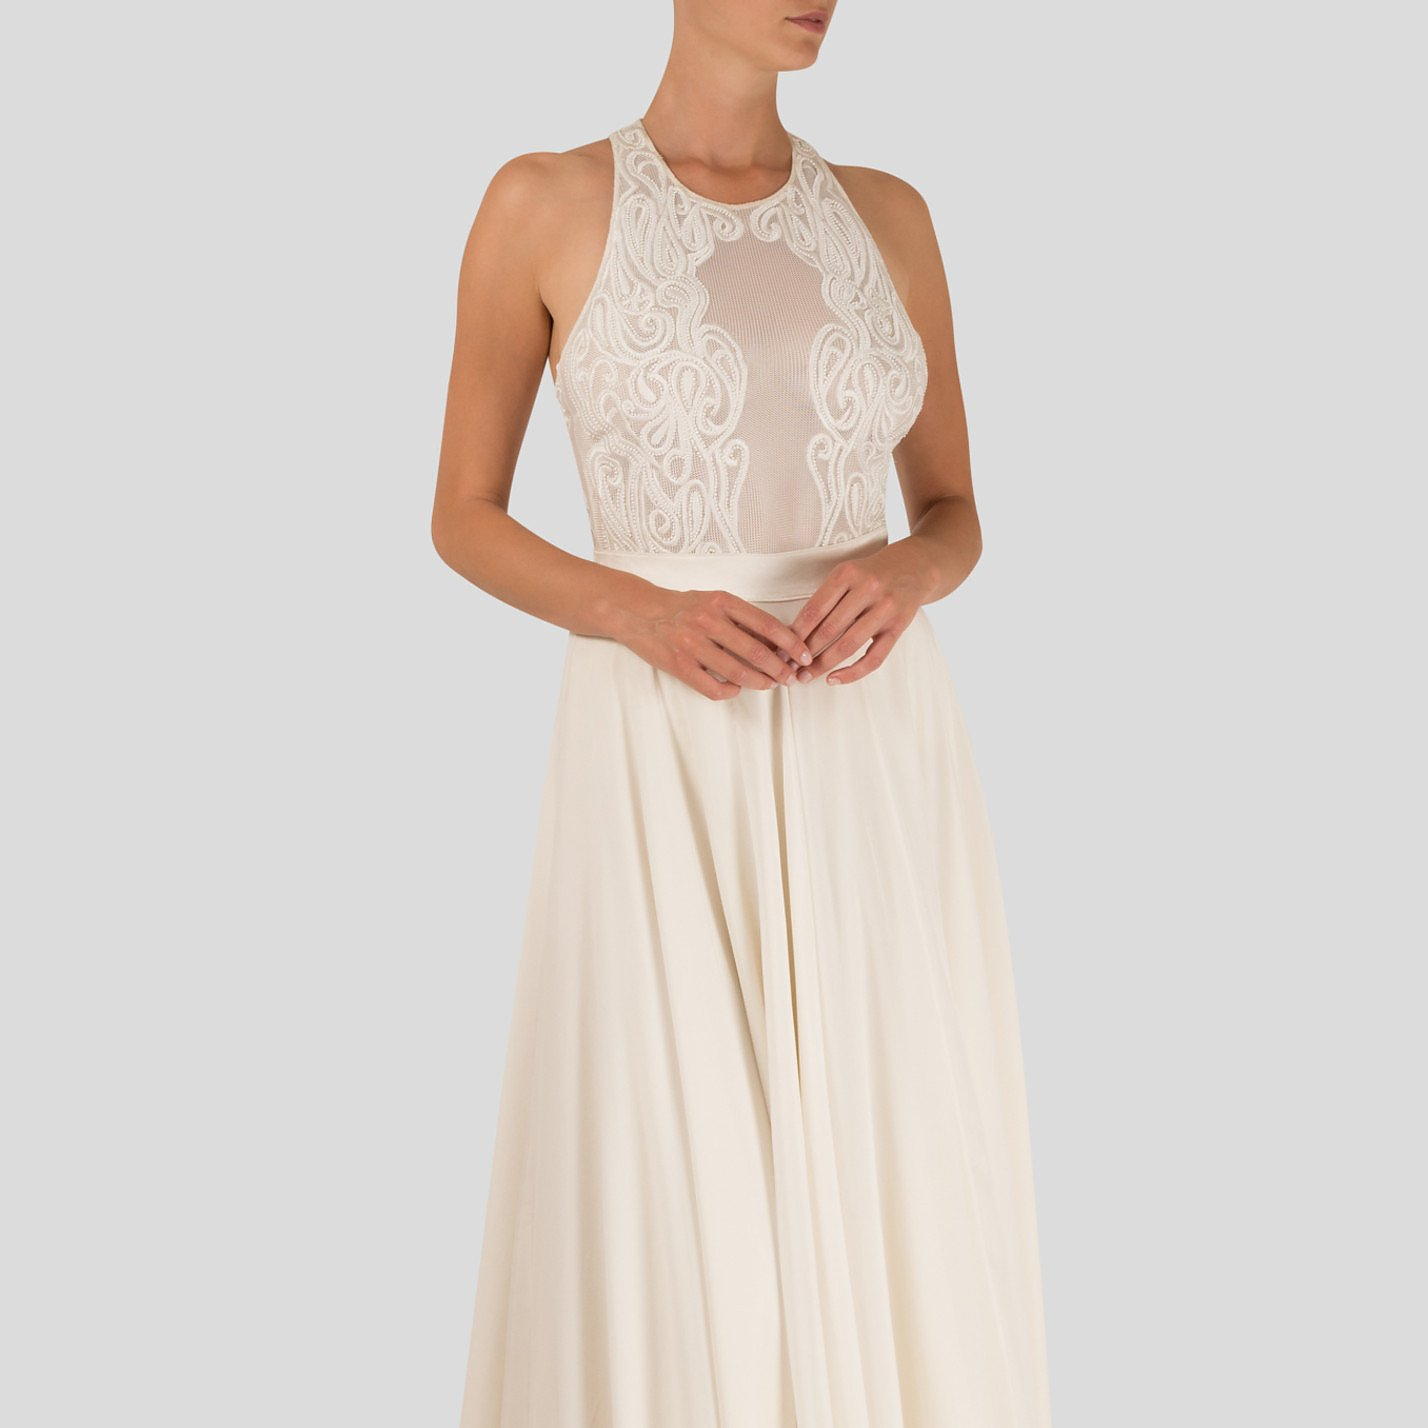 Amanda Wakeley Bridal The Skye Top